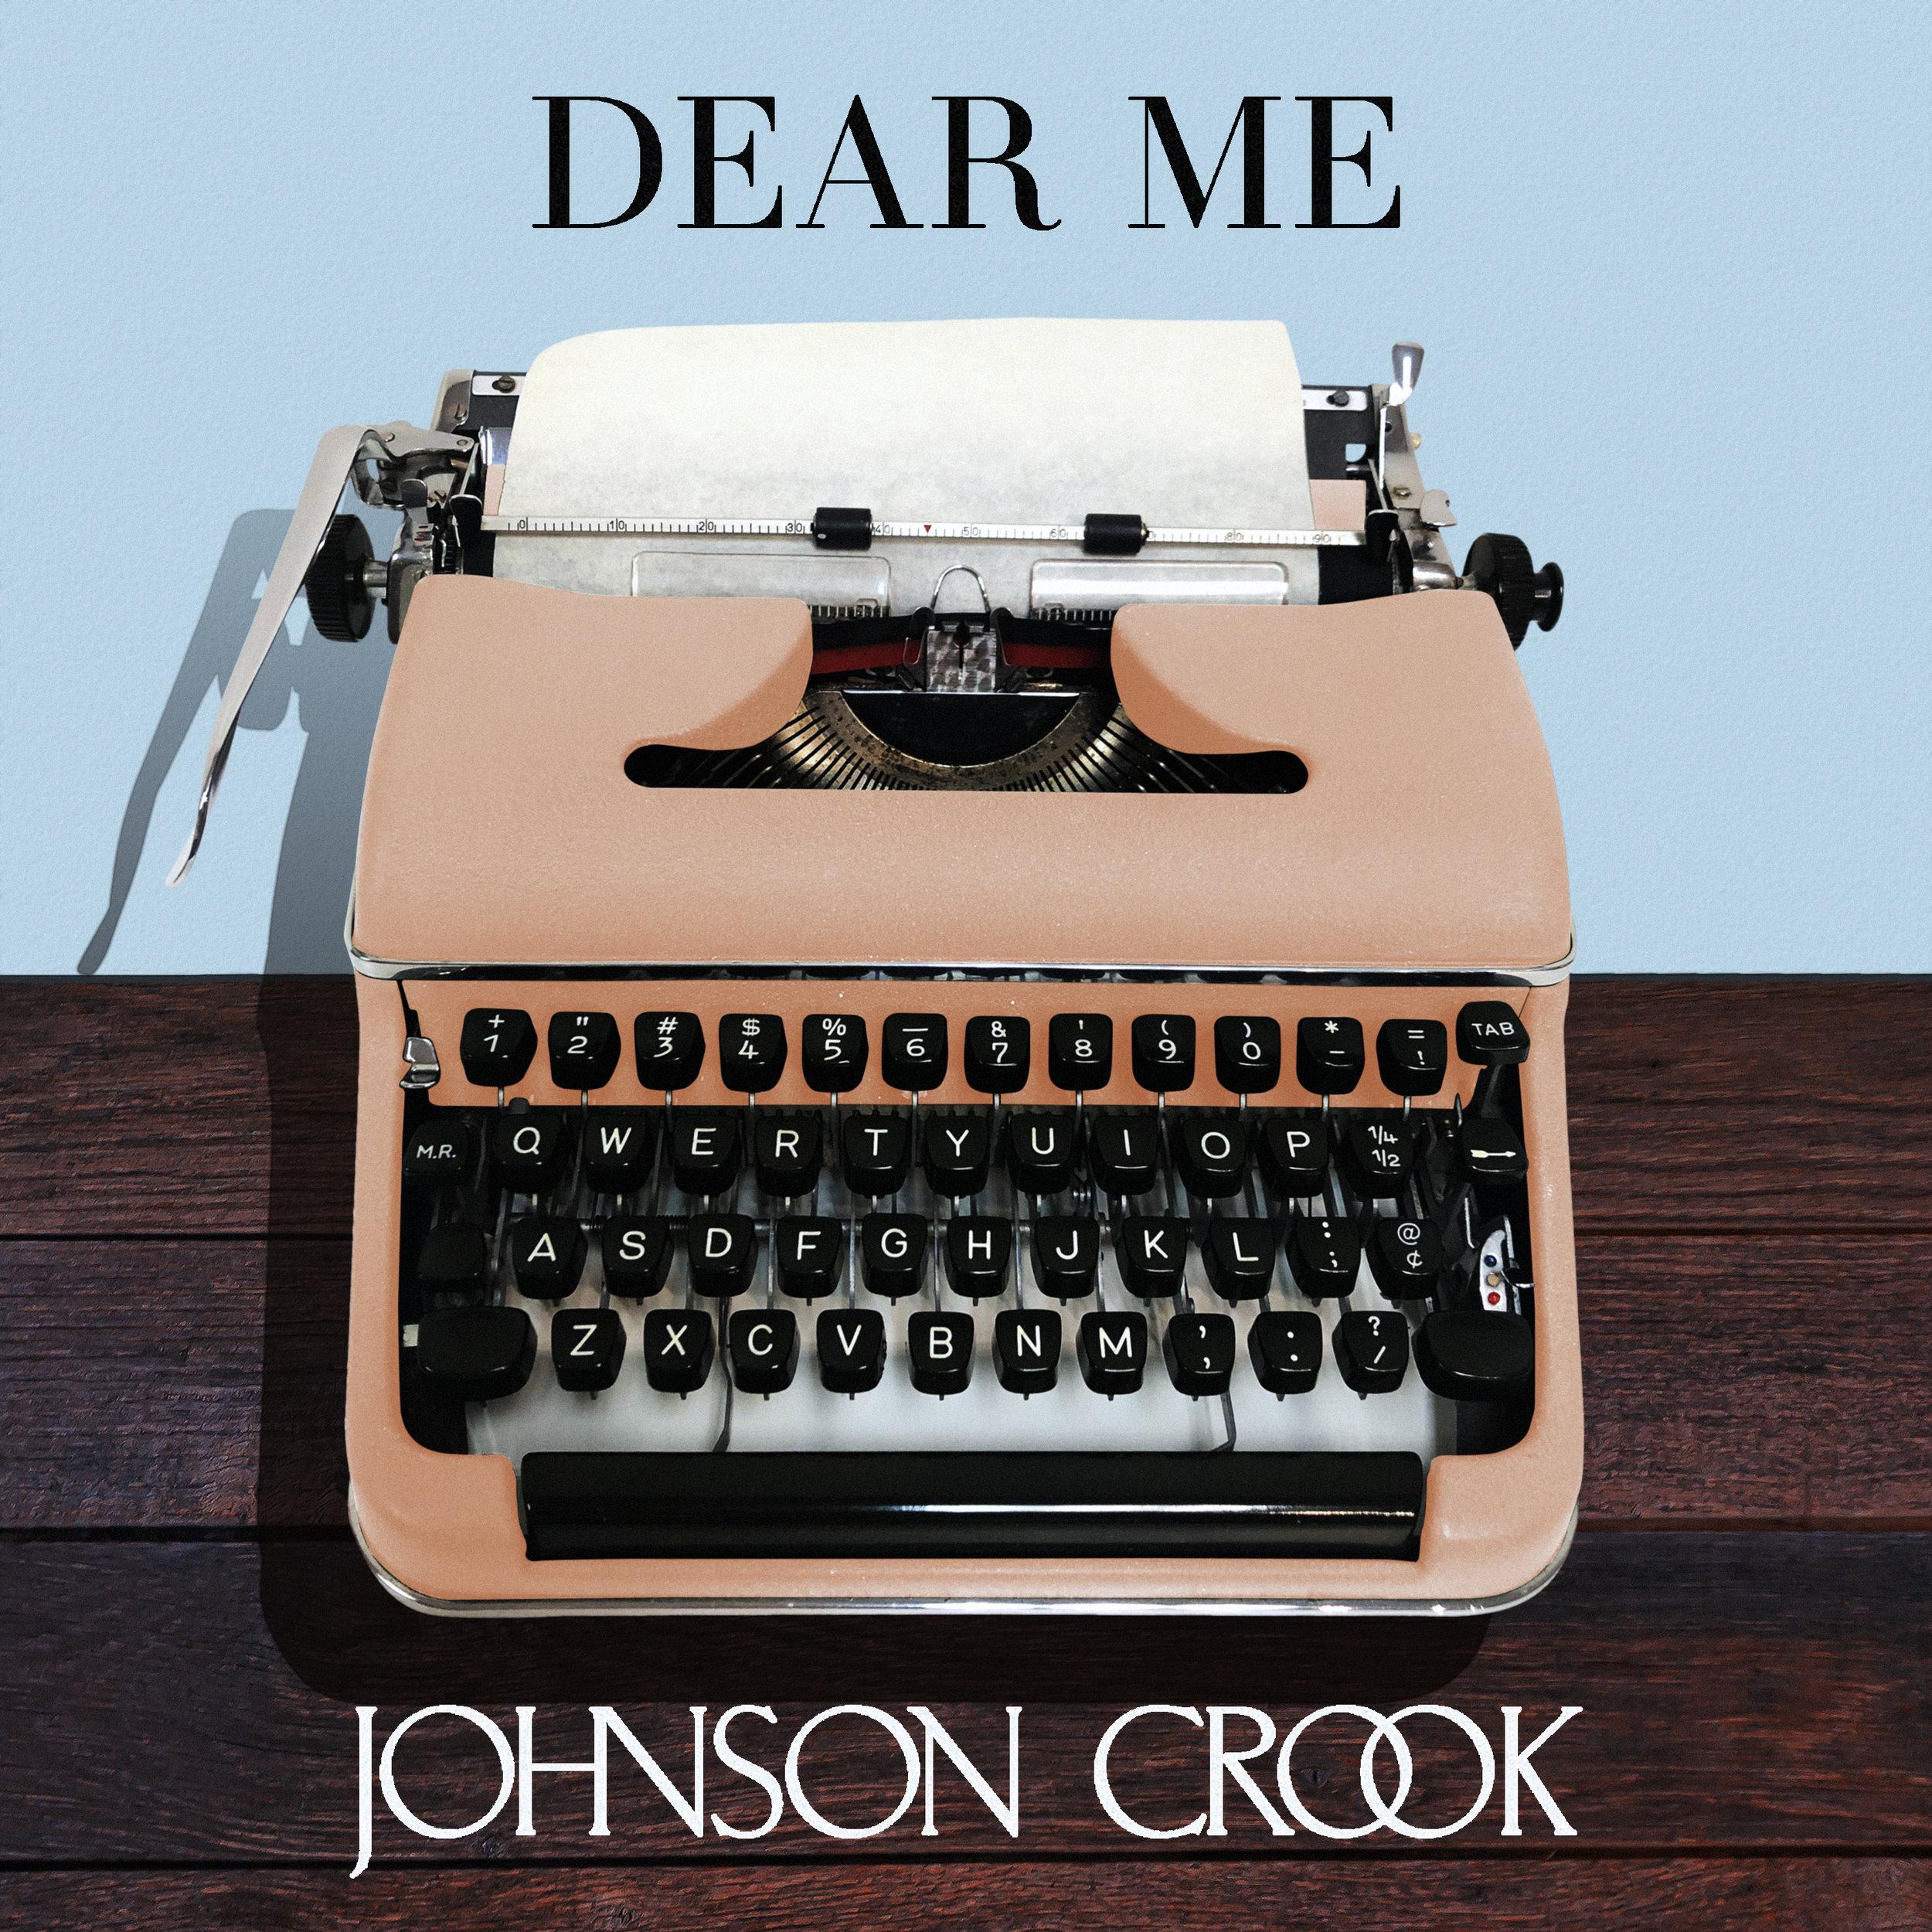 Artwork_Johnson Crook - Dear Me - Final Bold.jpg